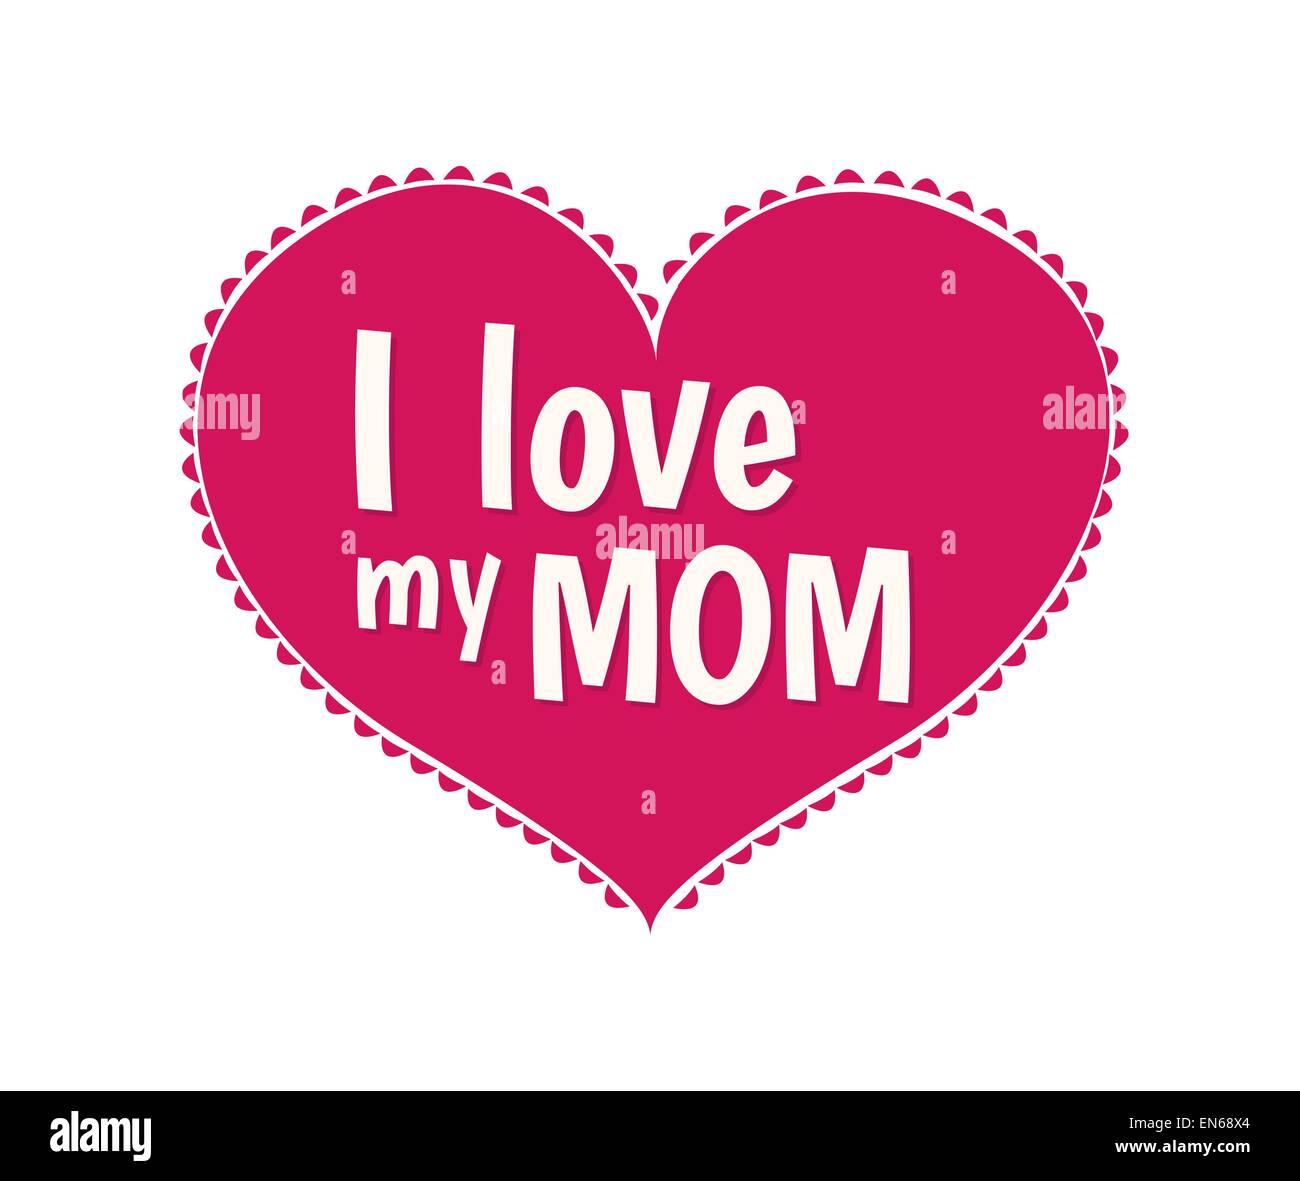 I love you mom stock photos i love you mom stock images alamy i love my mom vector stock image altavistaventures Gallery